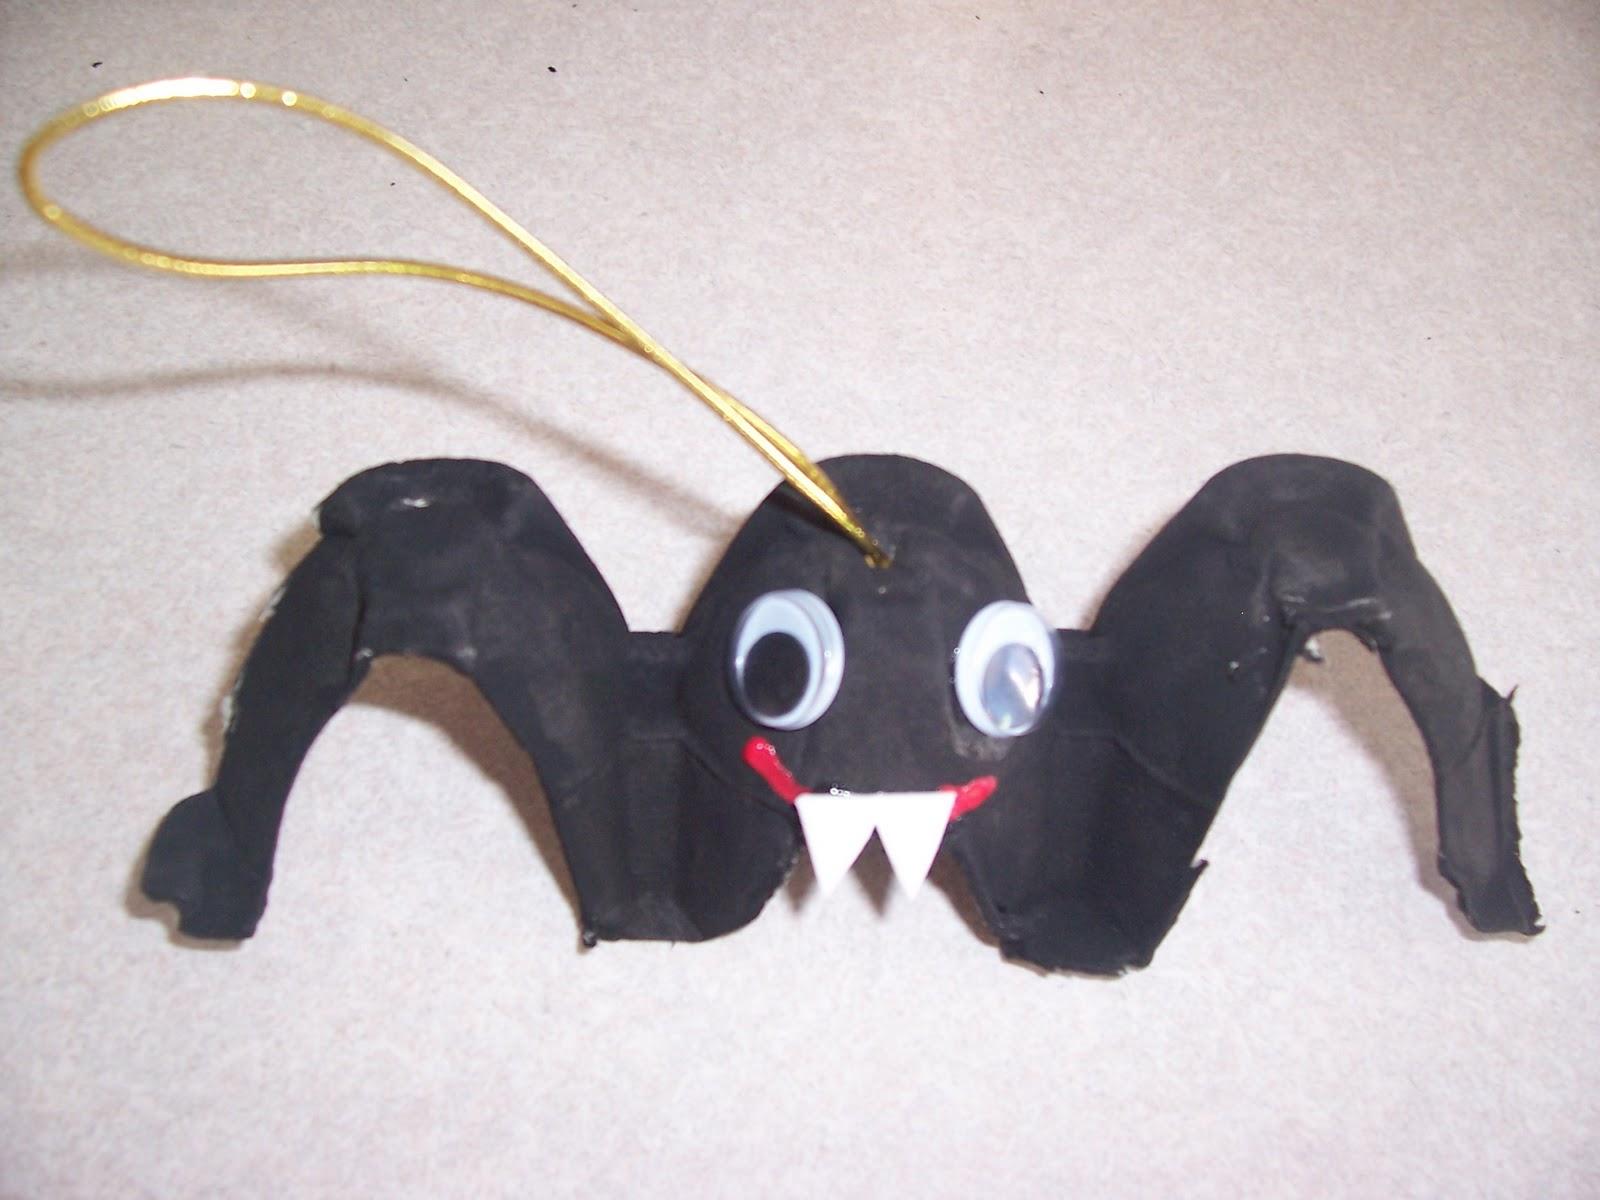 Egg Carton Bat Craft Project